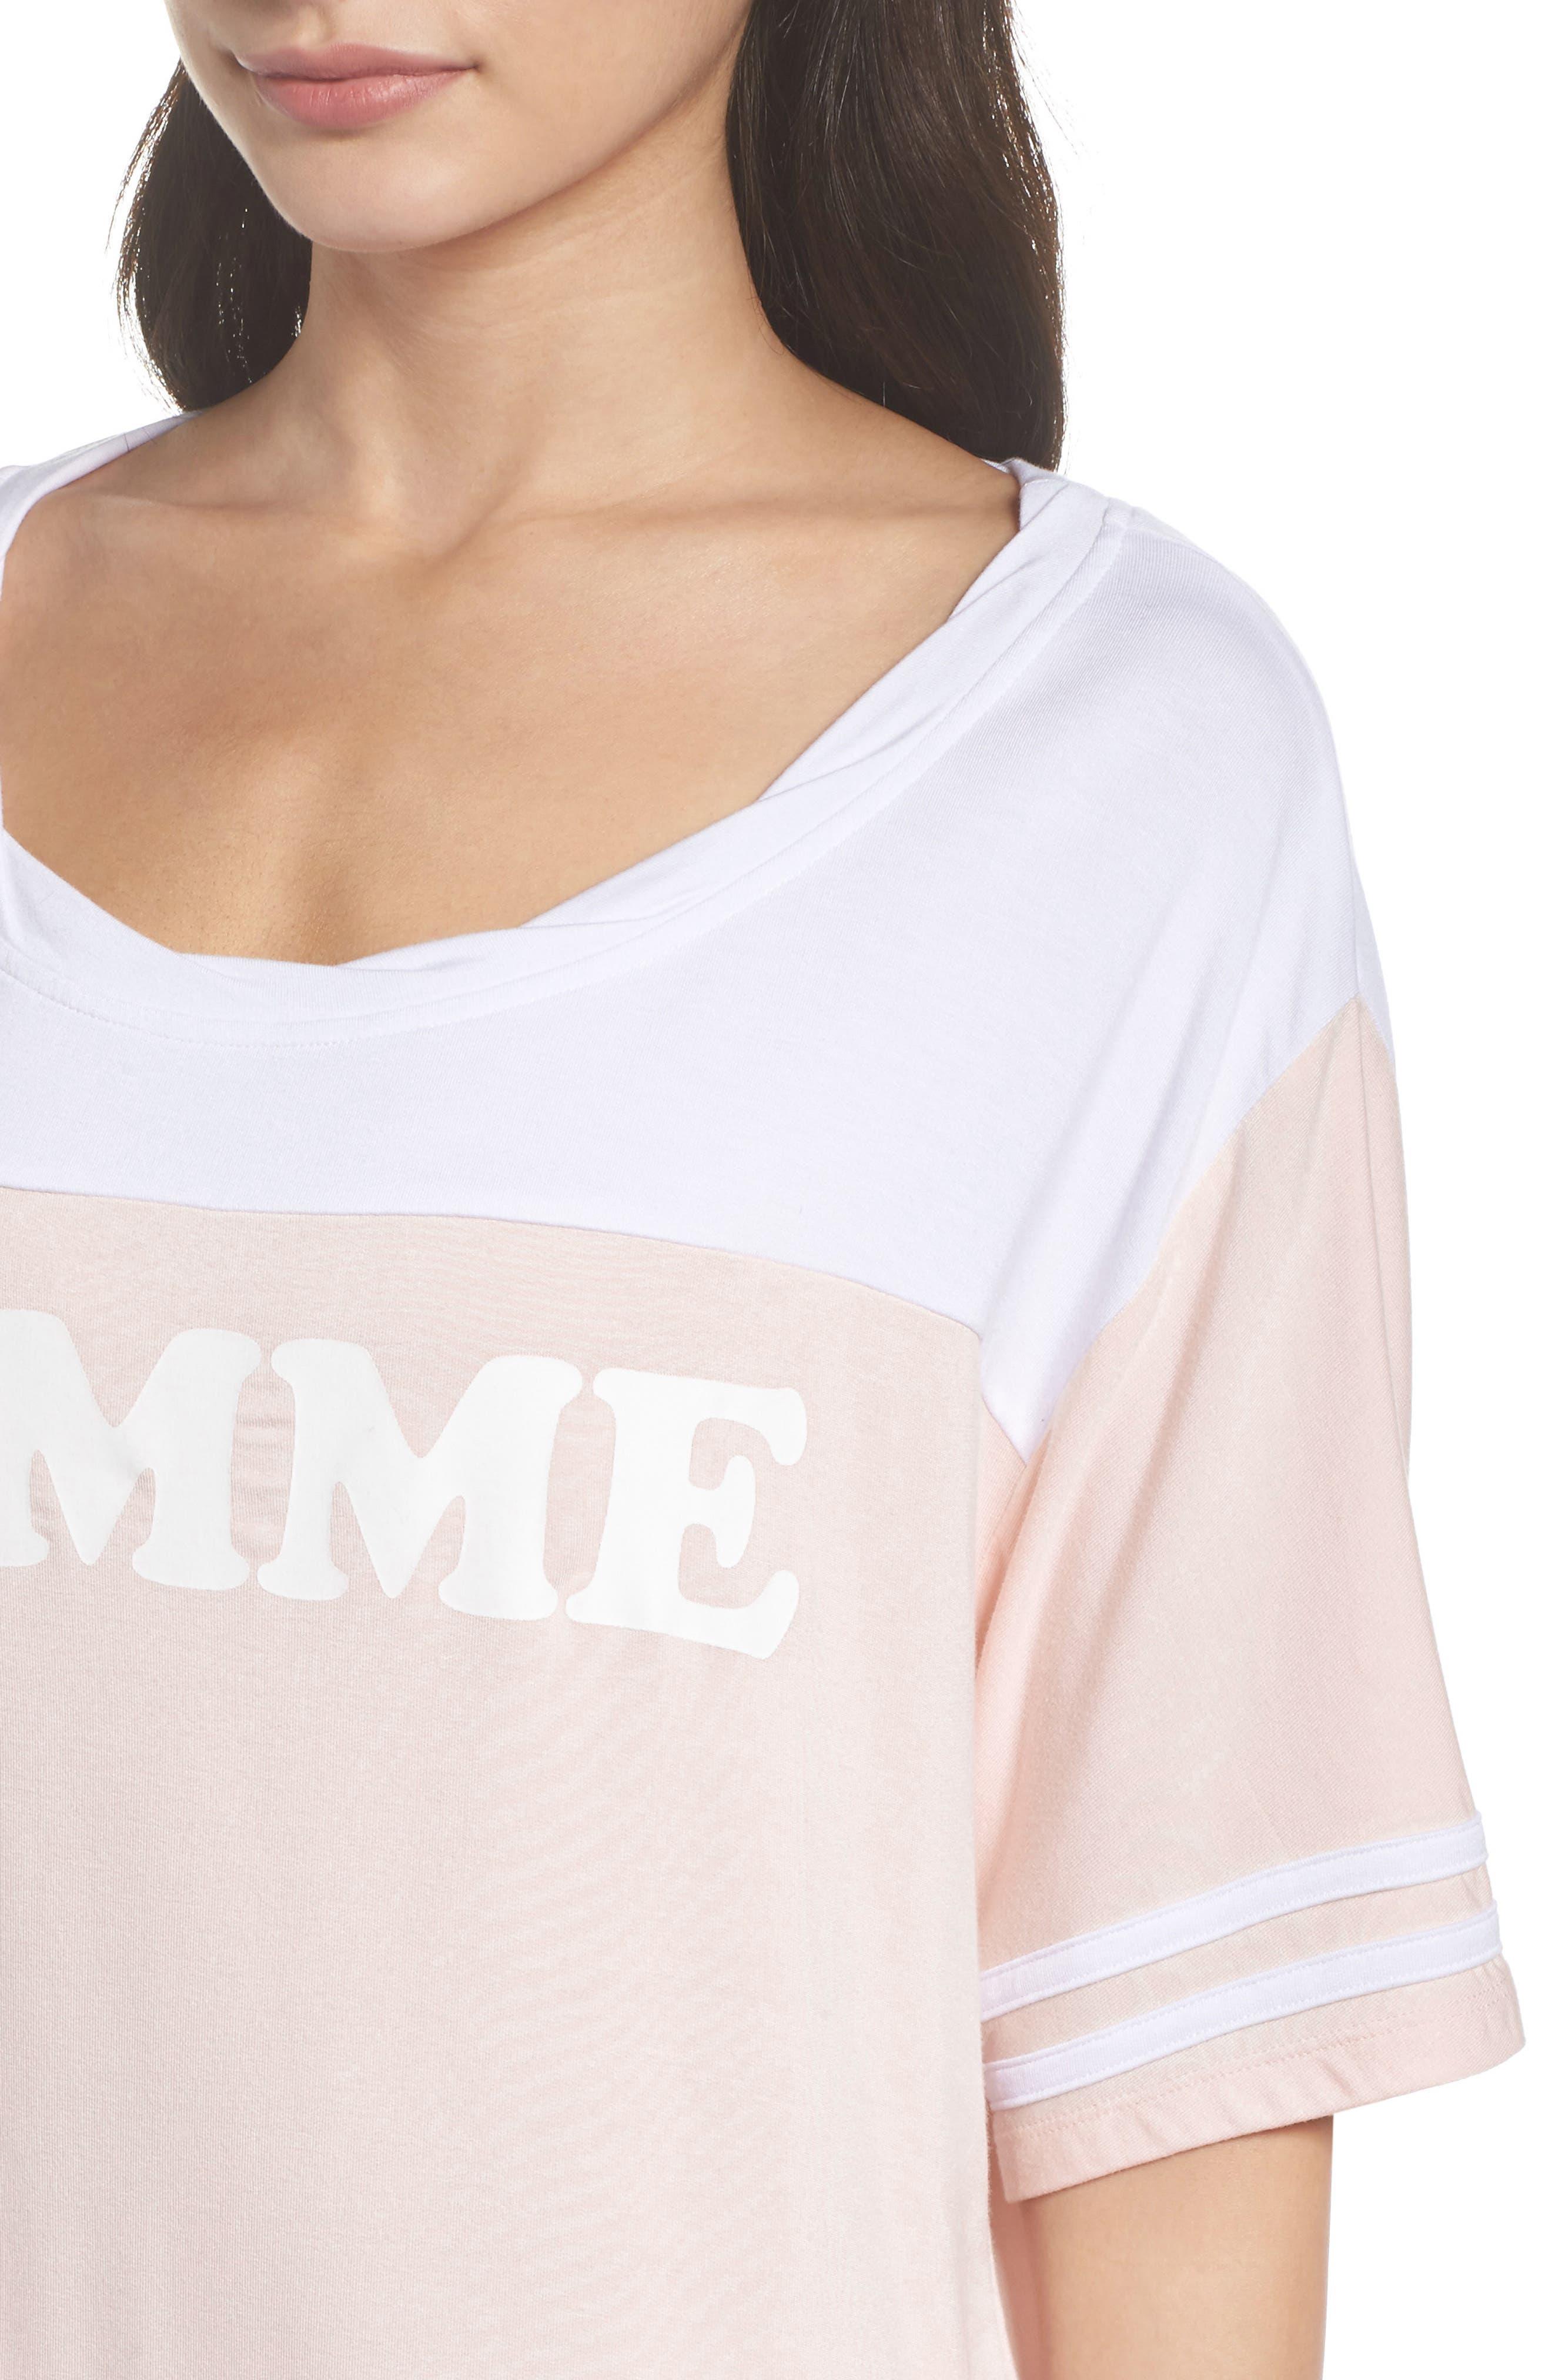 Team Femme Baggy Tee,                             Alternate thumbnail 4, color,                             693